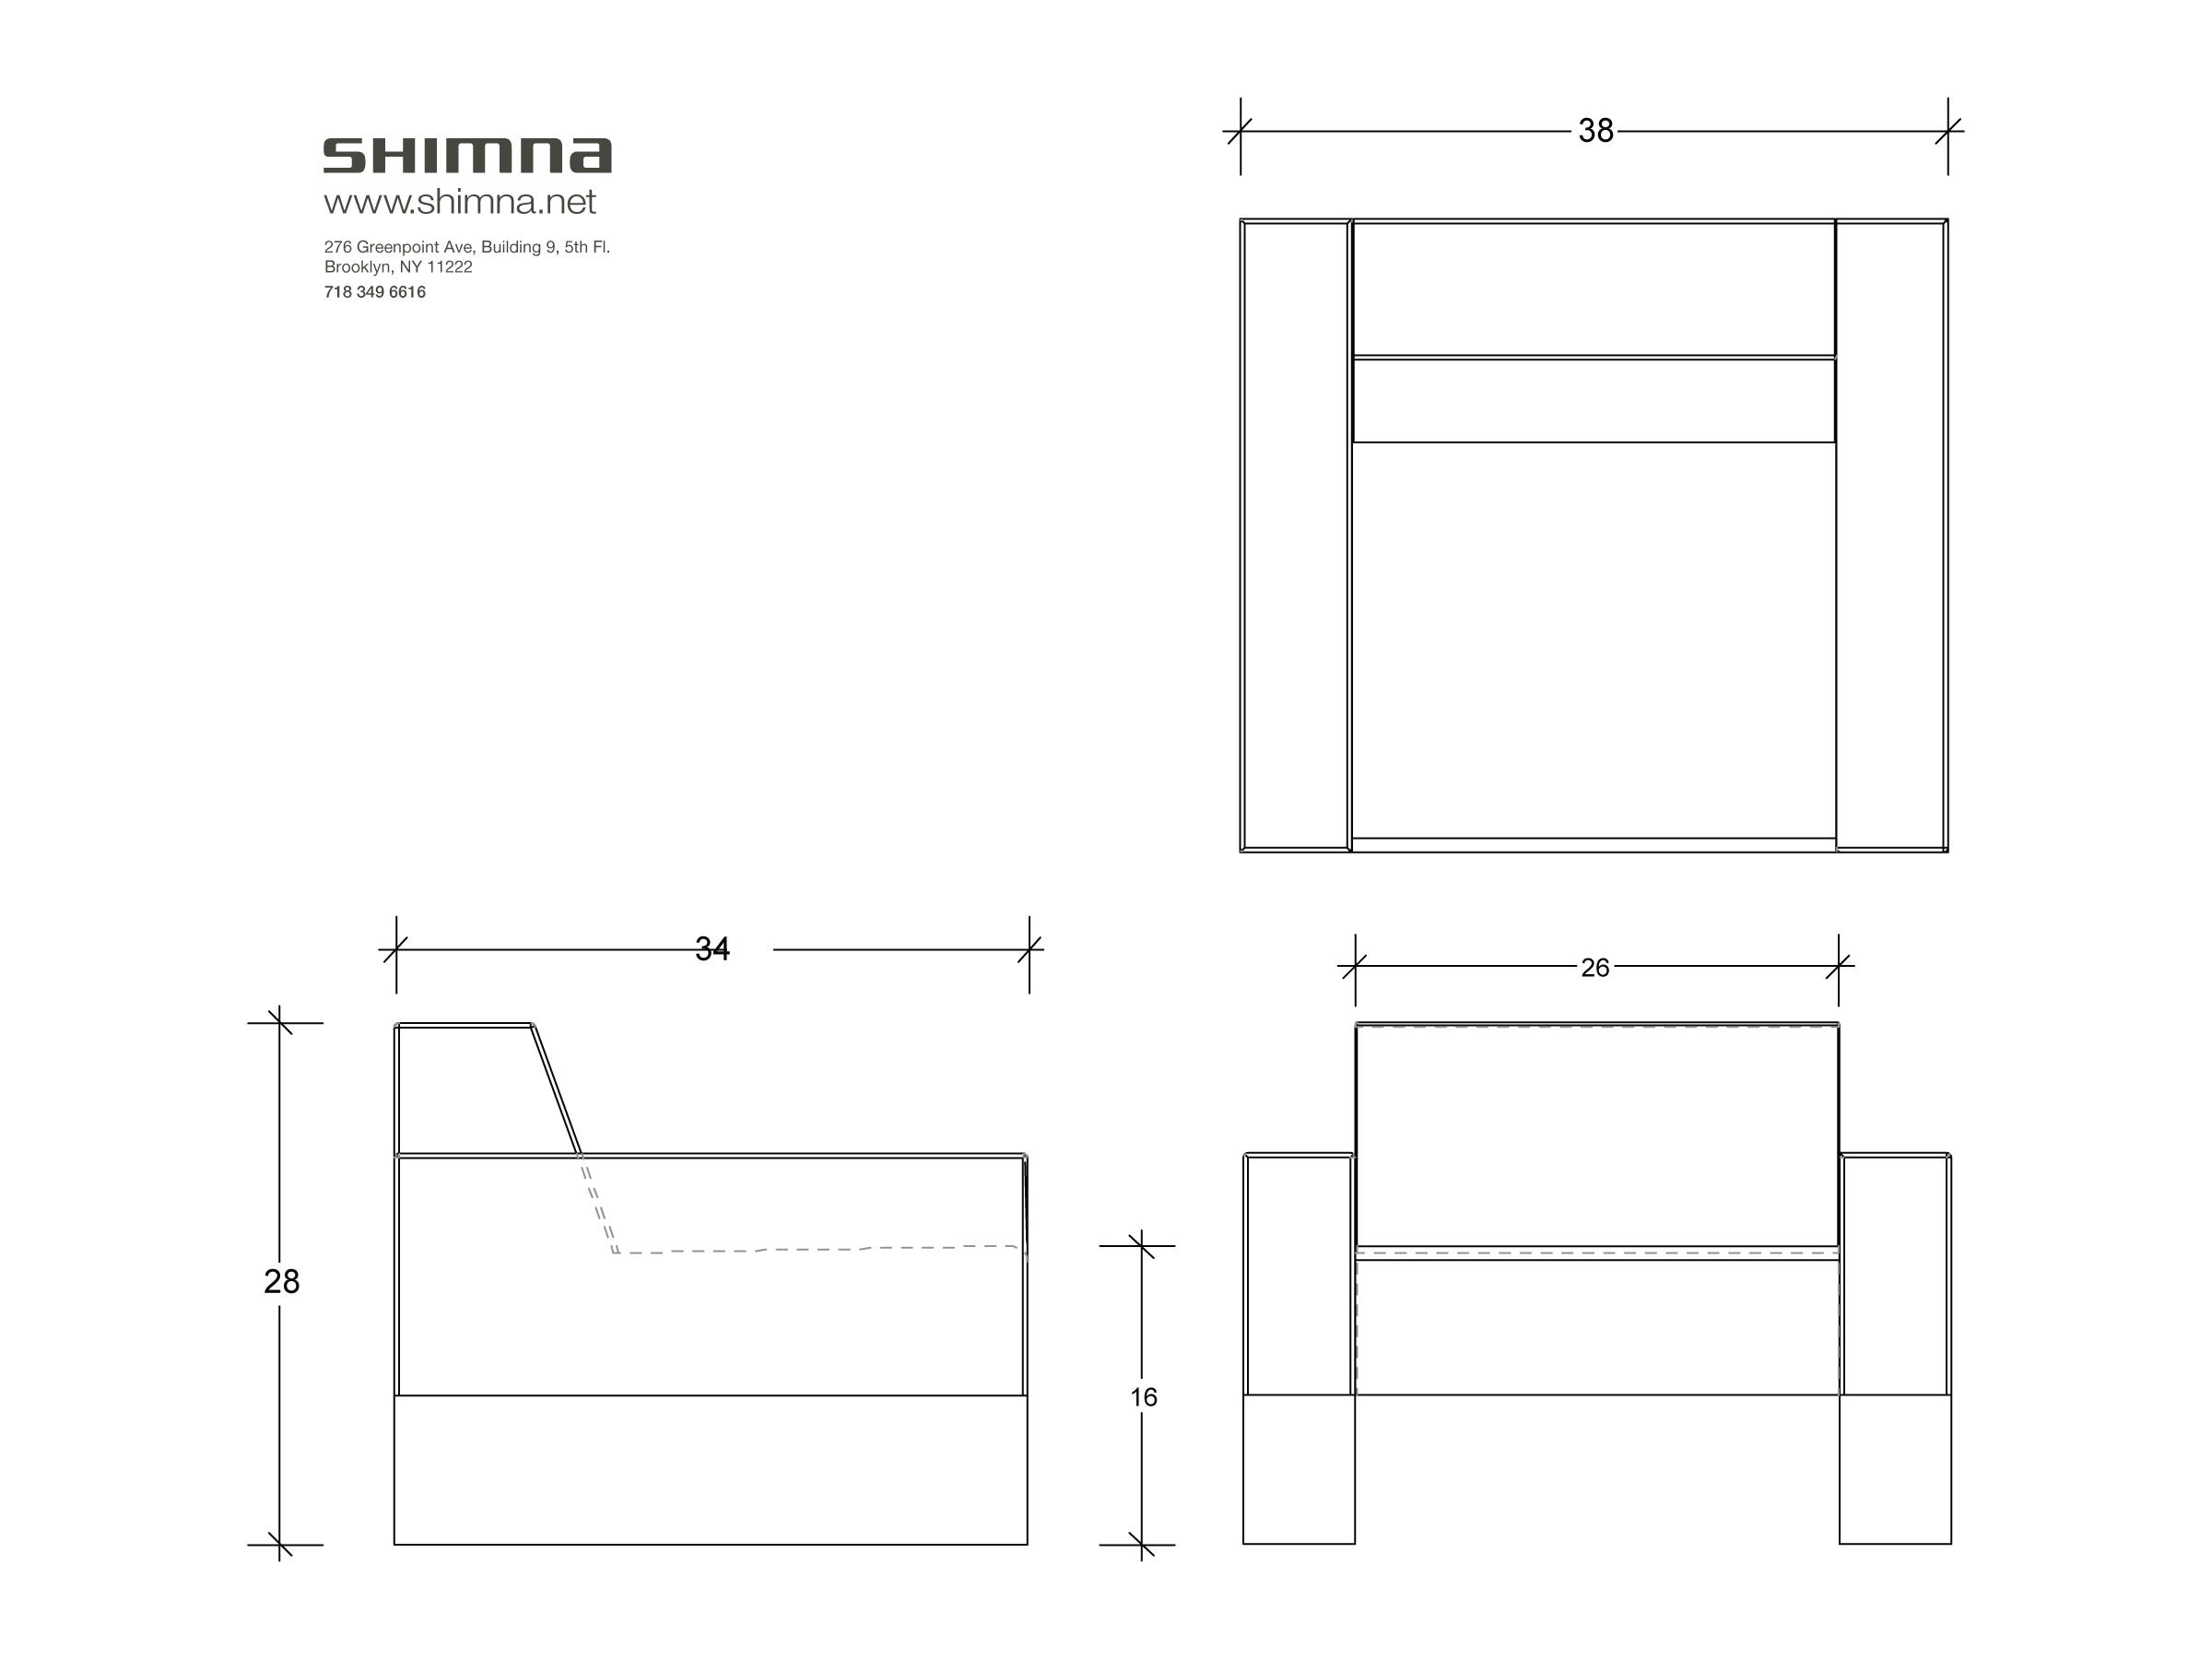 Plan Dimensional Drawing